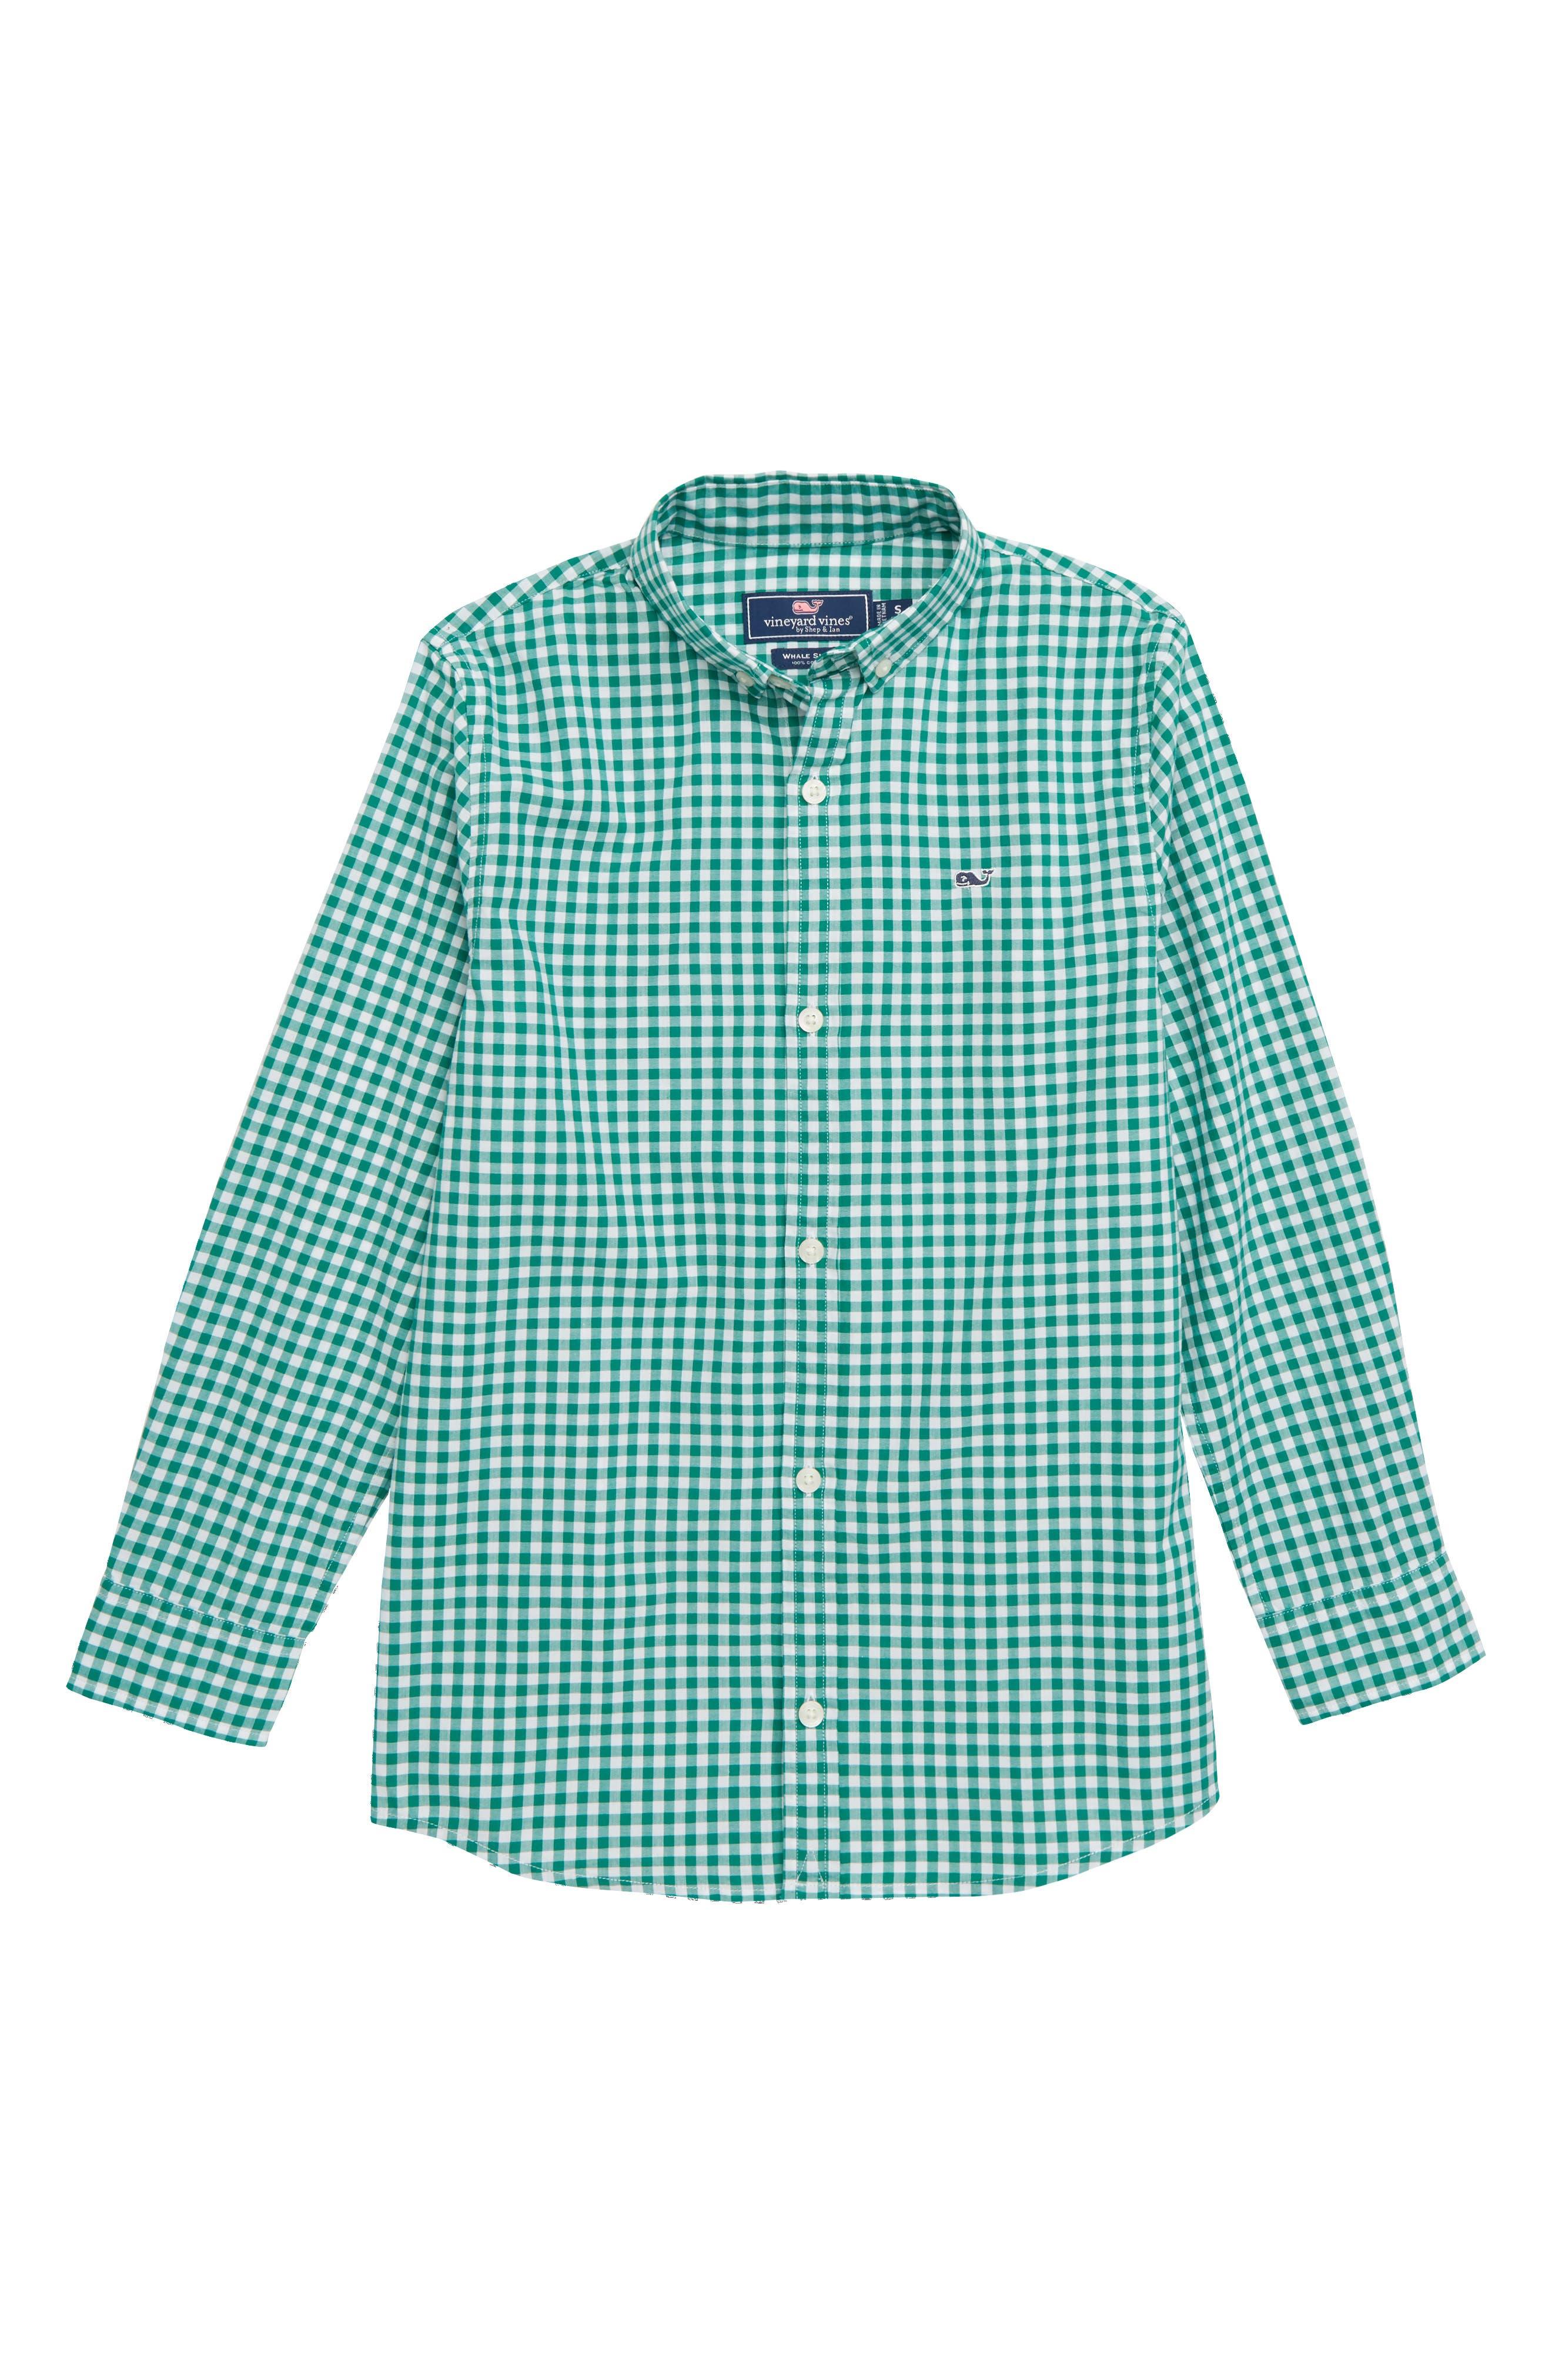 Rockridge Poplin Whale Shirt,                             Main thumbnail 1, color,                             GREEN MEADOW